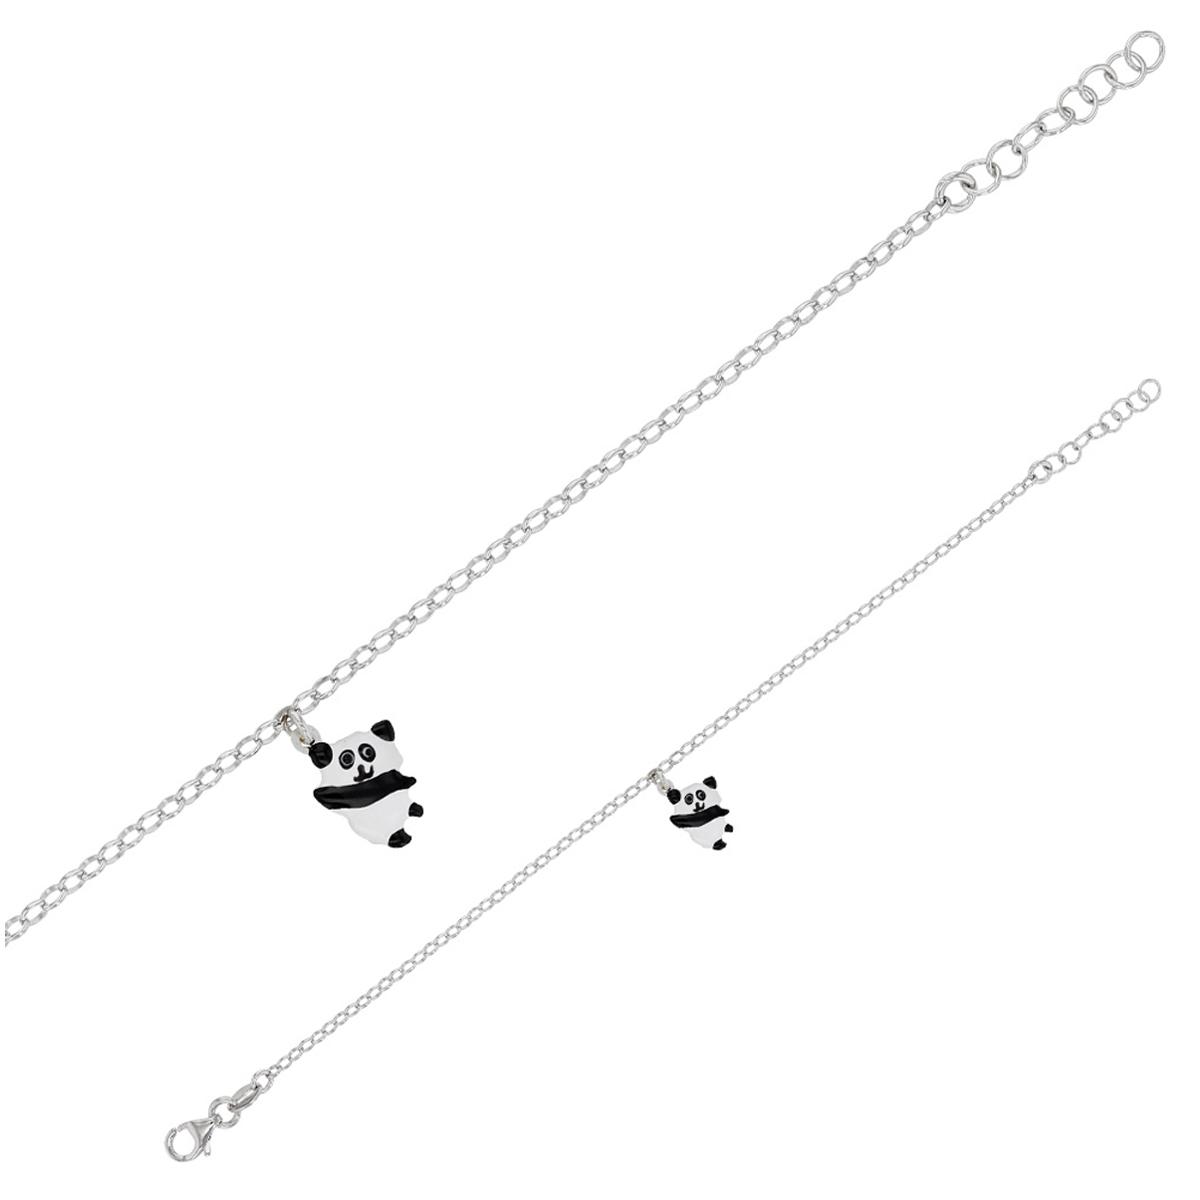 Bracelet Enfant \'Panda\' blanc noir S&B - 10x9 mm - [Q6014]